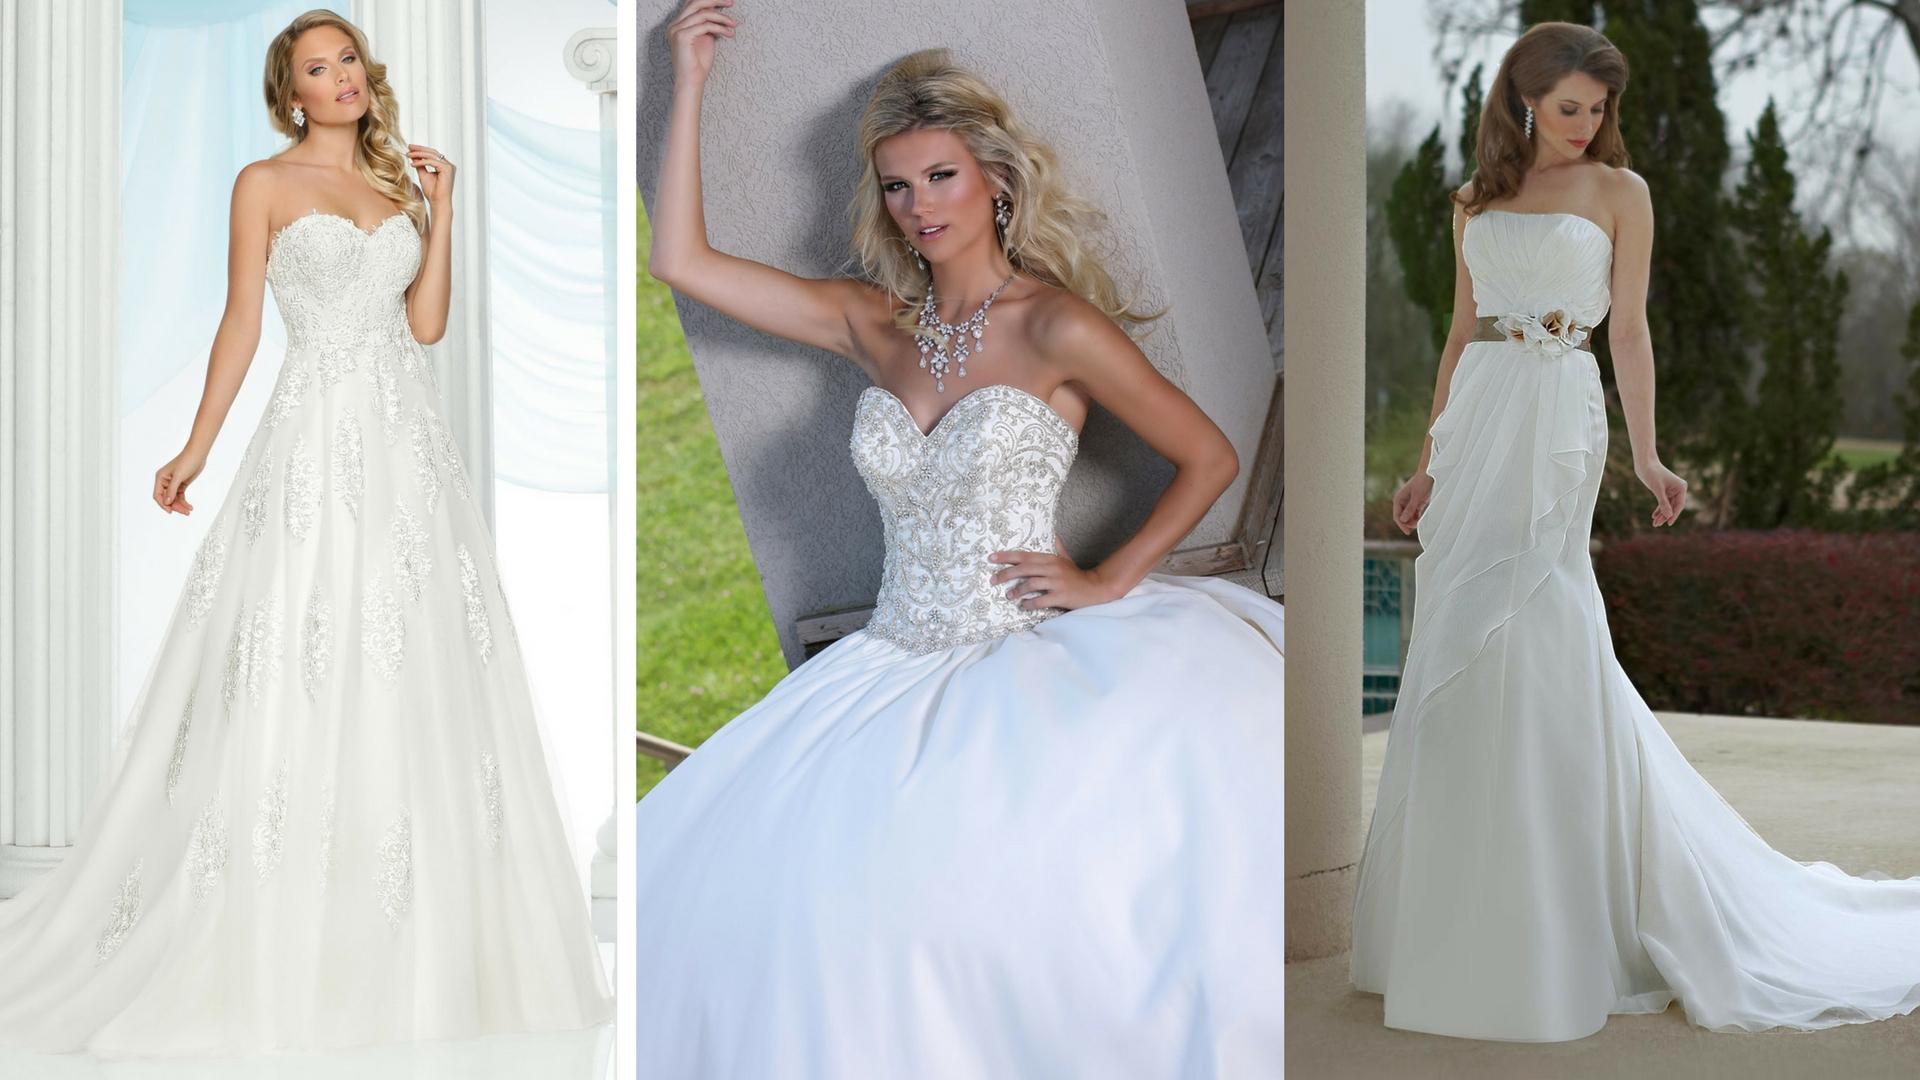 Wavy with Tulle Mermaid Wedding Dress